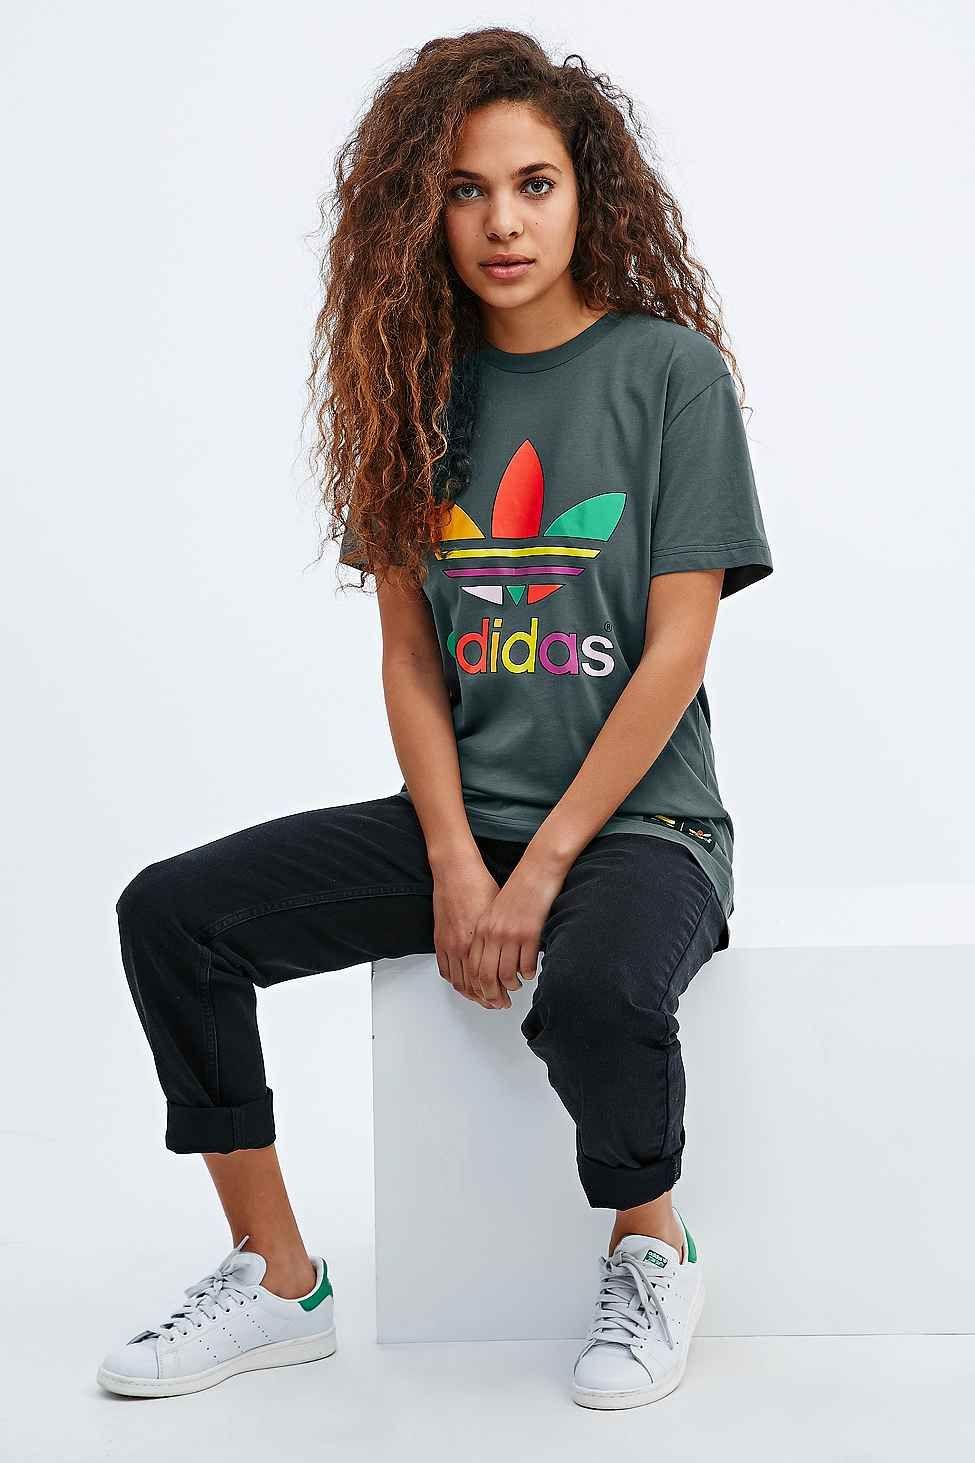 Adidas in X Pharrell Supercolor Tee in Adidas Khaki | Adidas on street 13306c